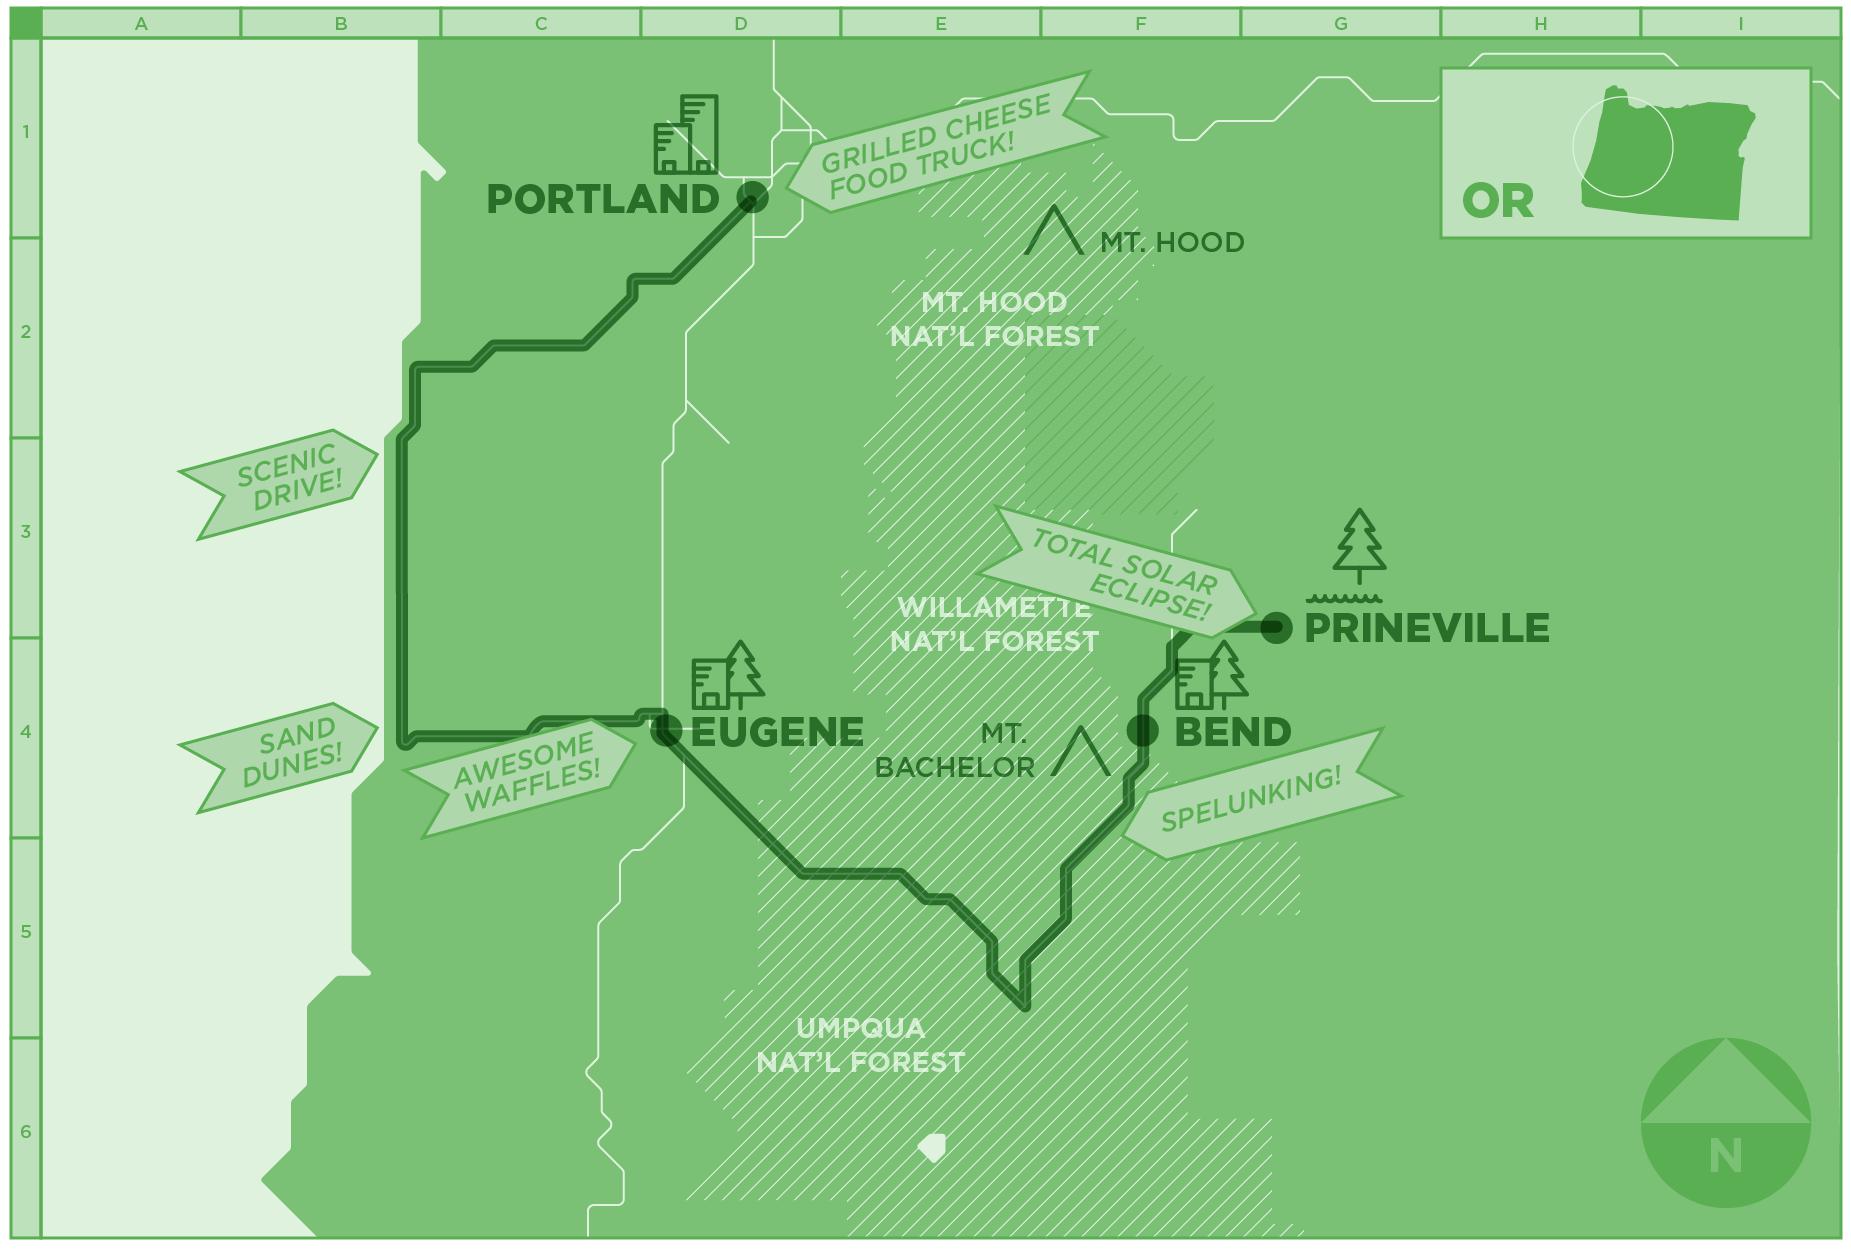 The Ultimate Summer Marijuana Road Trip Through Oregon | Leafly